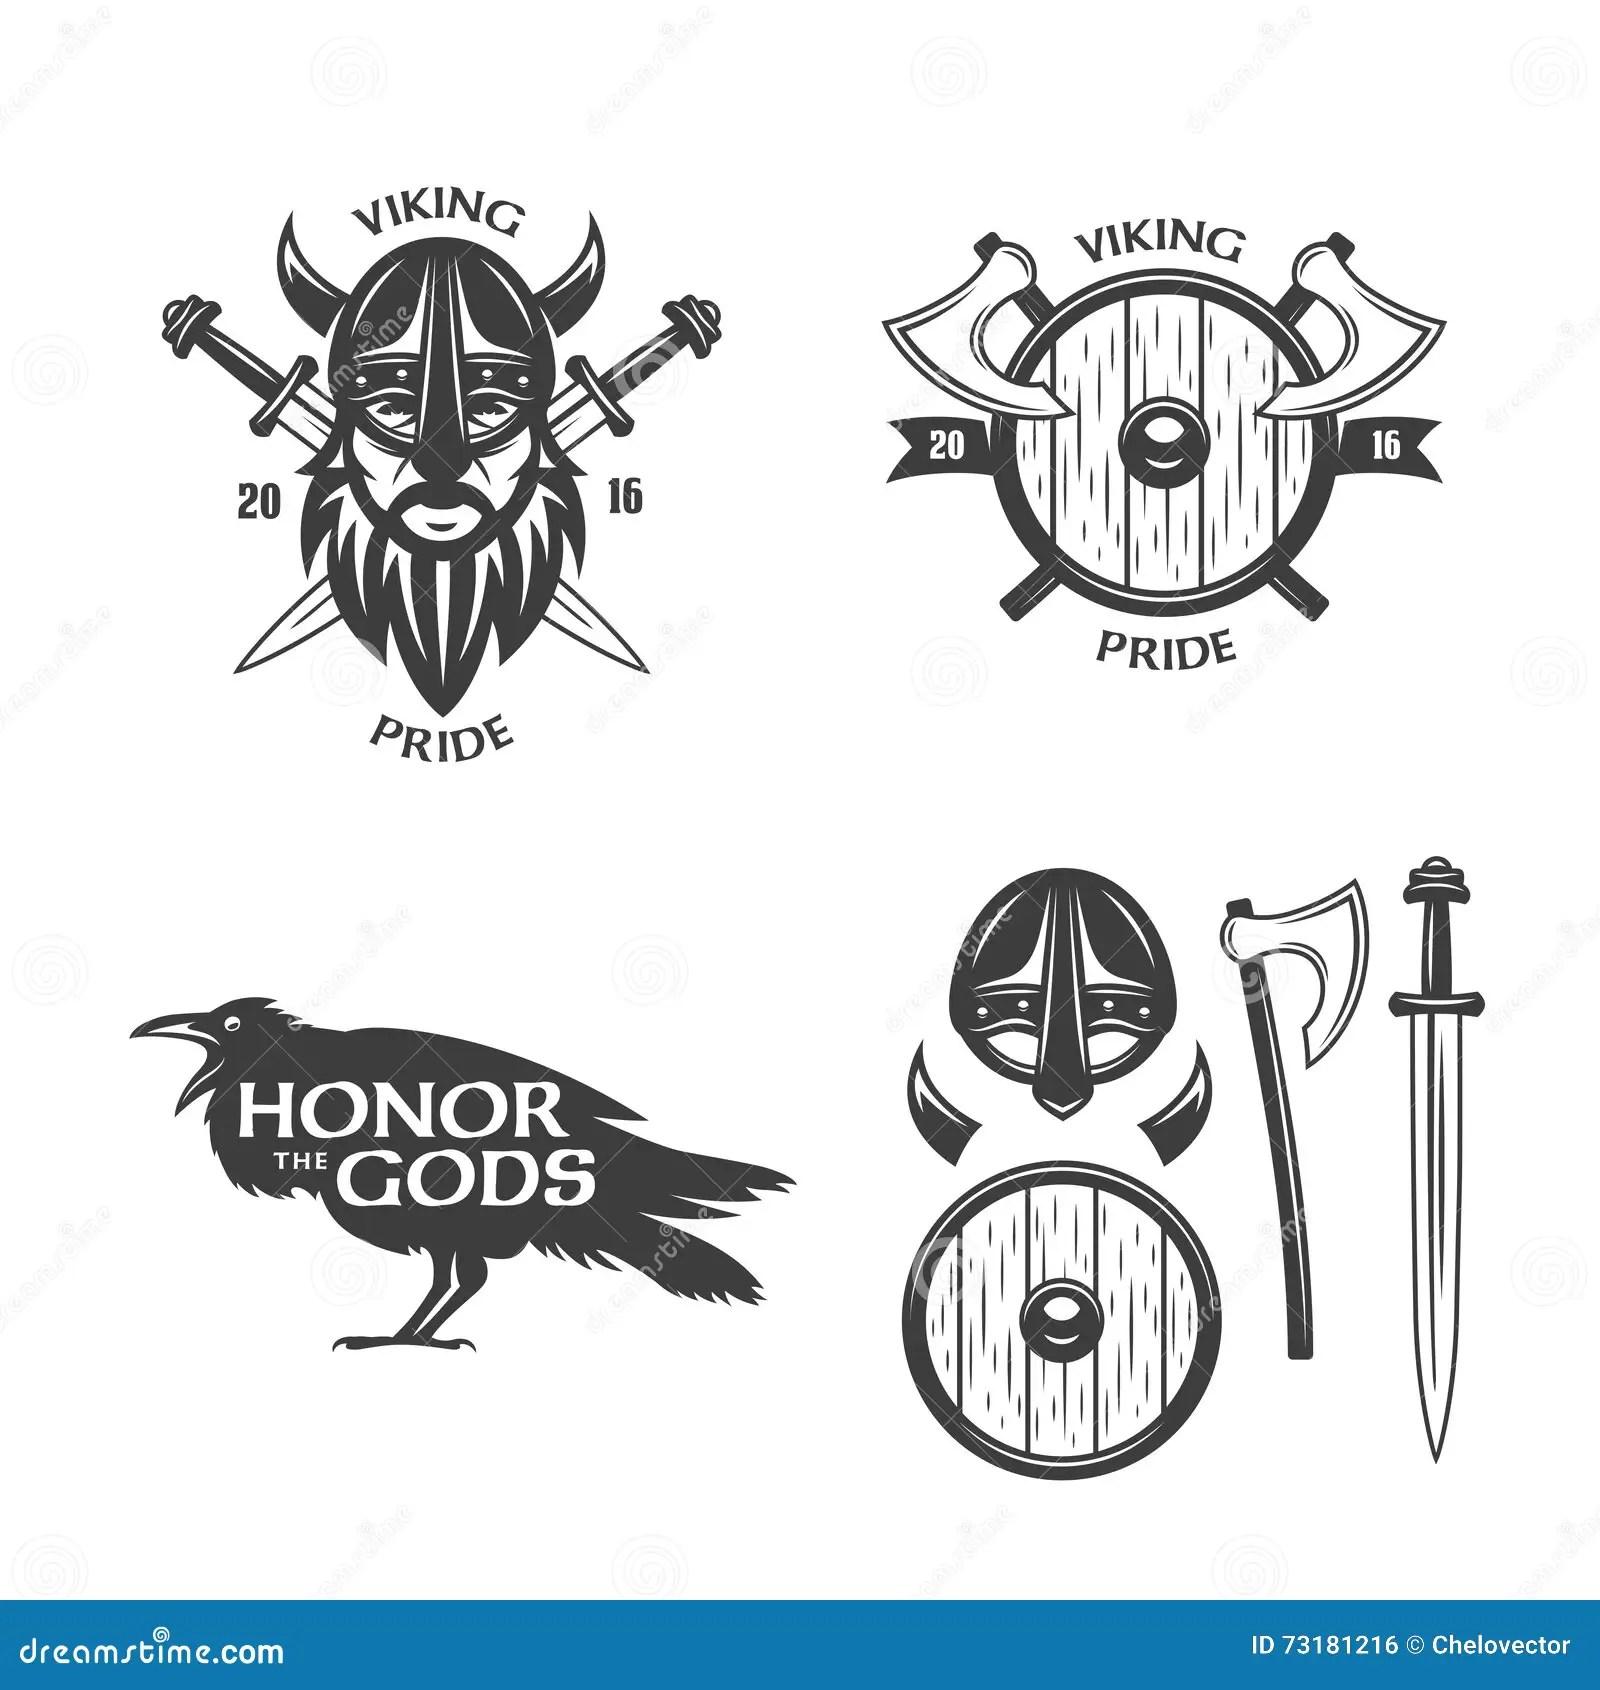 Stencil Vector Graphics Vector Art Tee Design Logo T